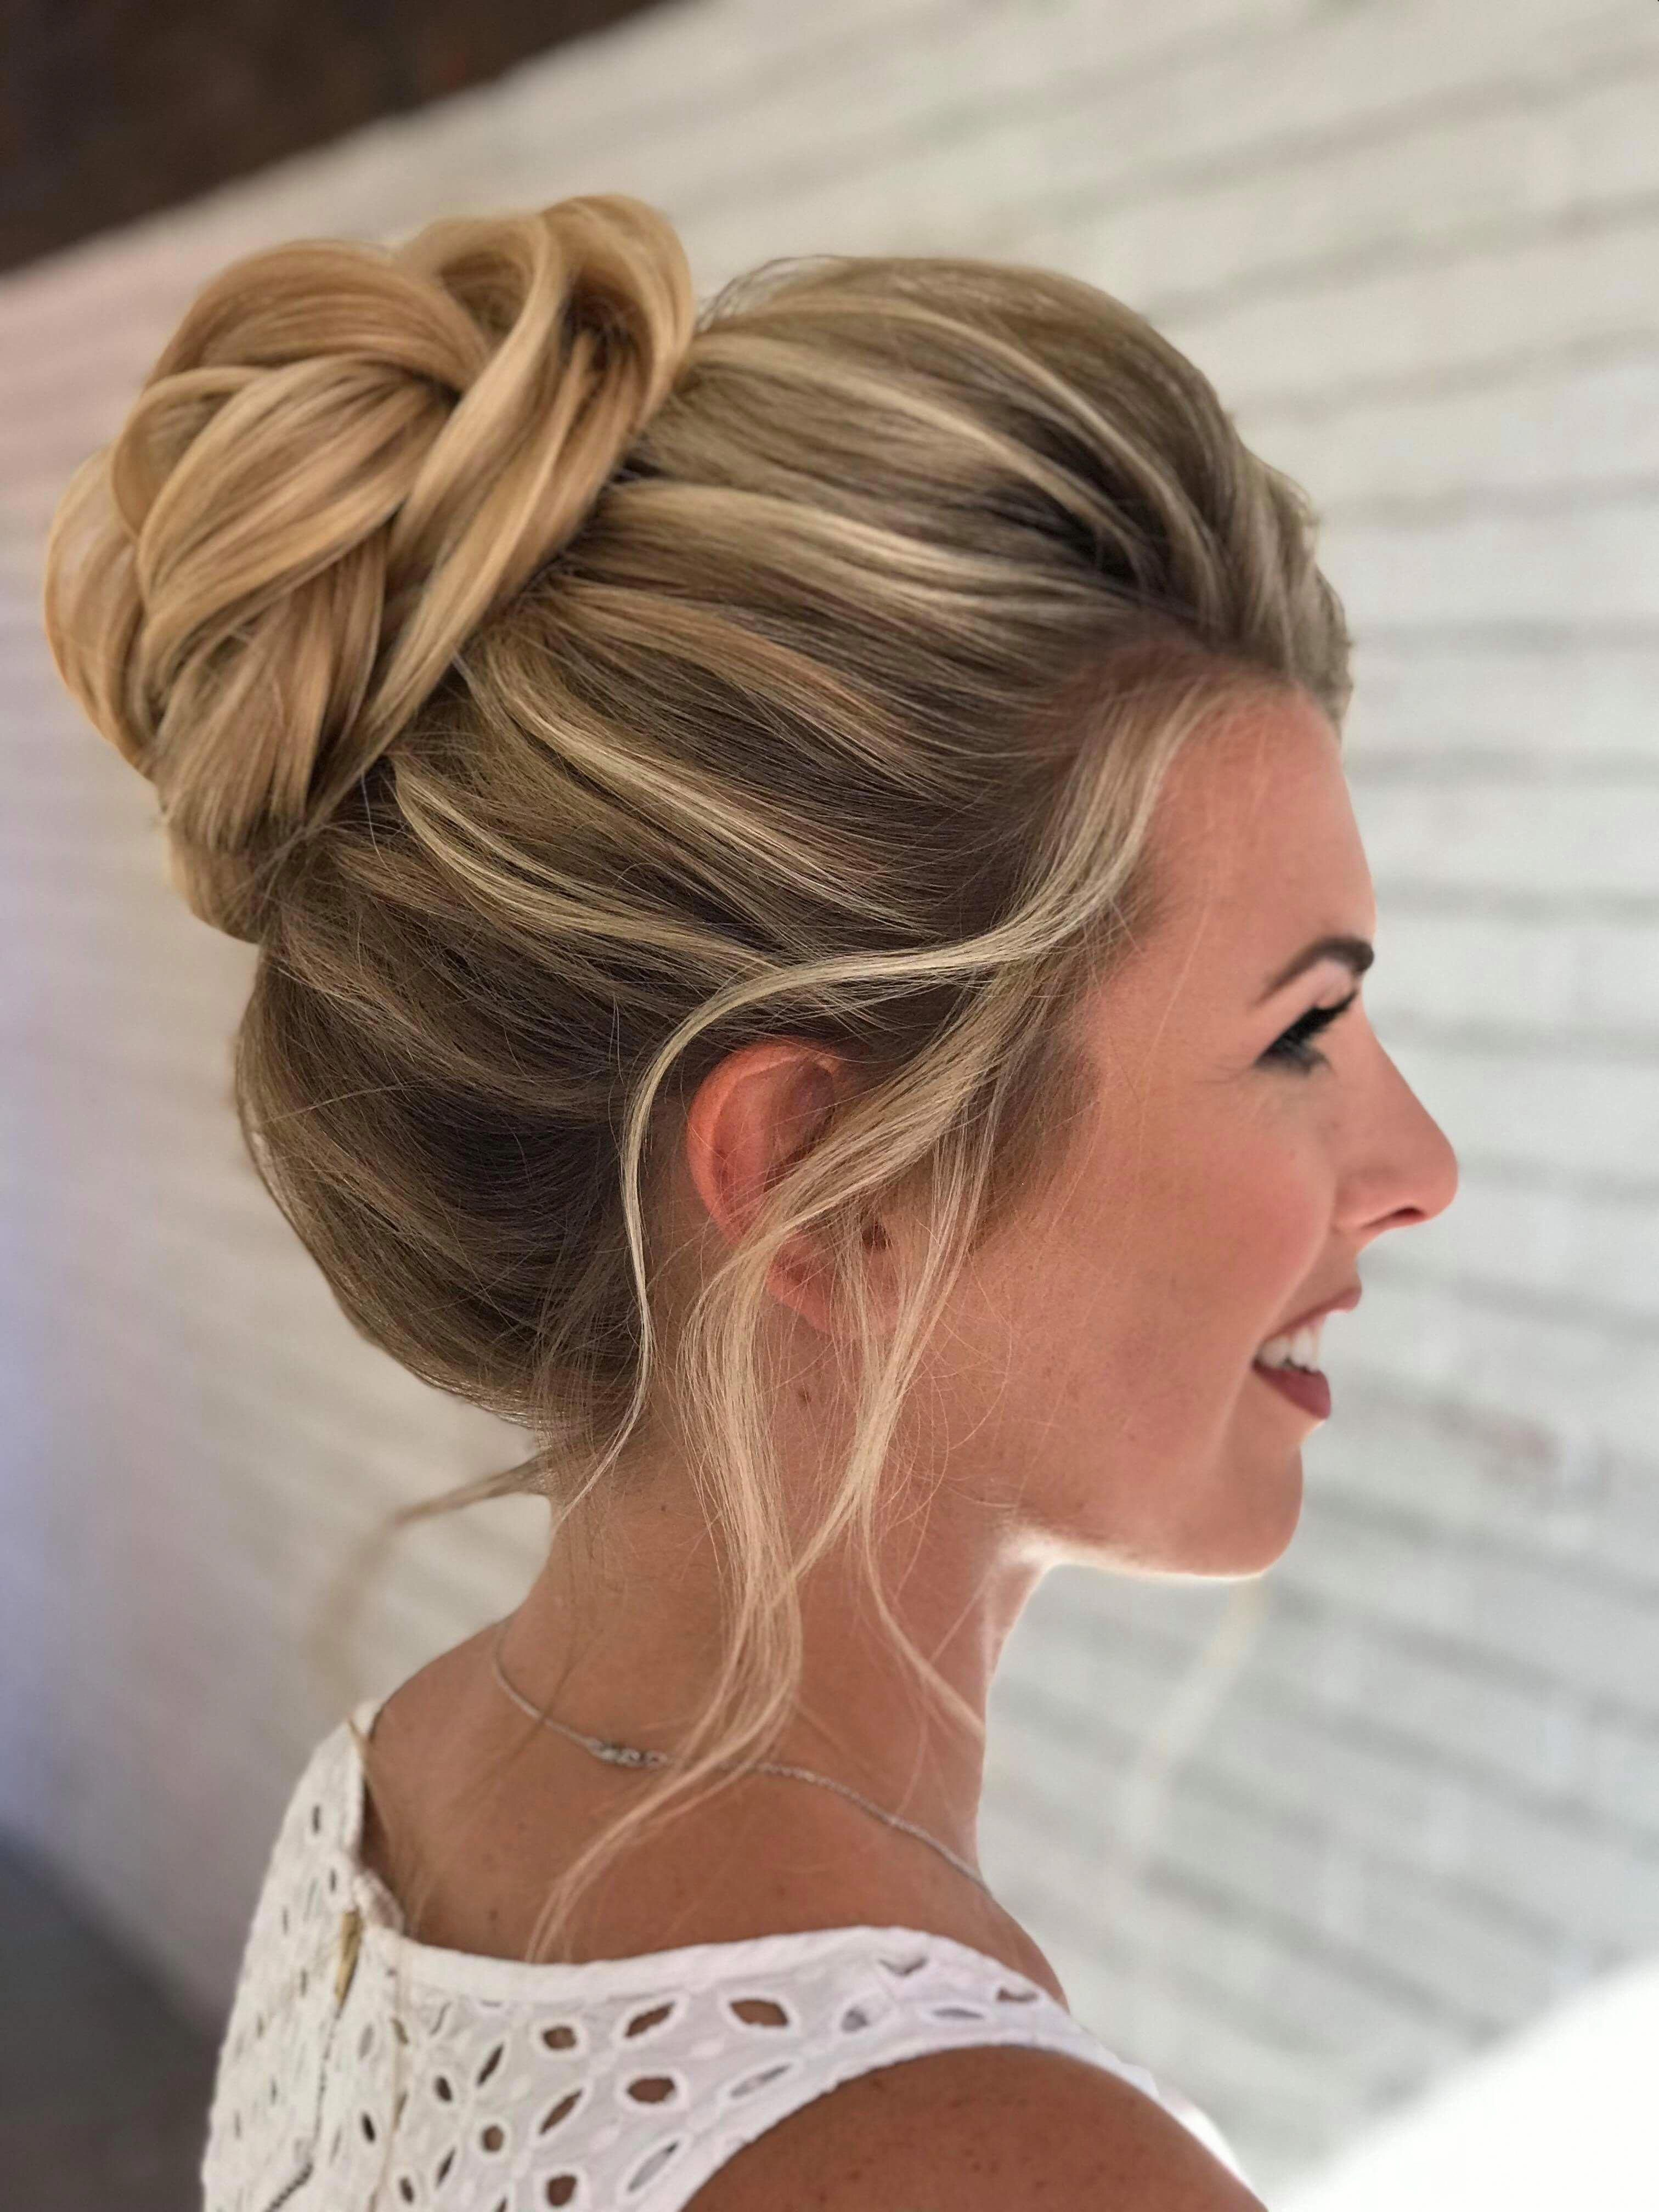 Pin By Joanholivia On P R O M Bridesmaid Hair Bun High Bun Hairstyles Bridesmaid Hair Updo